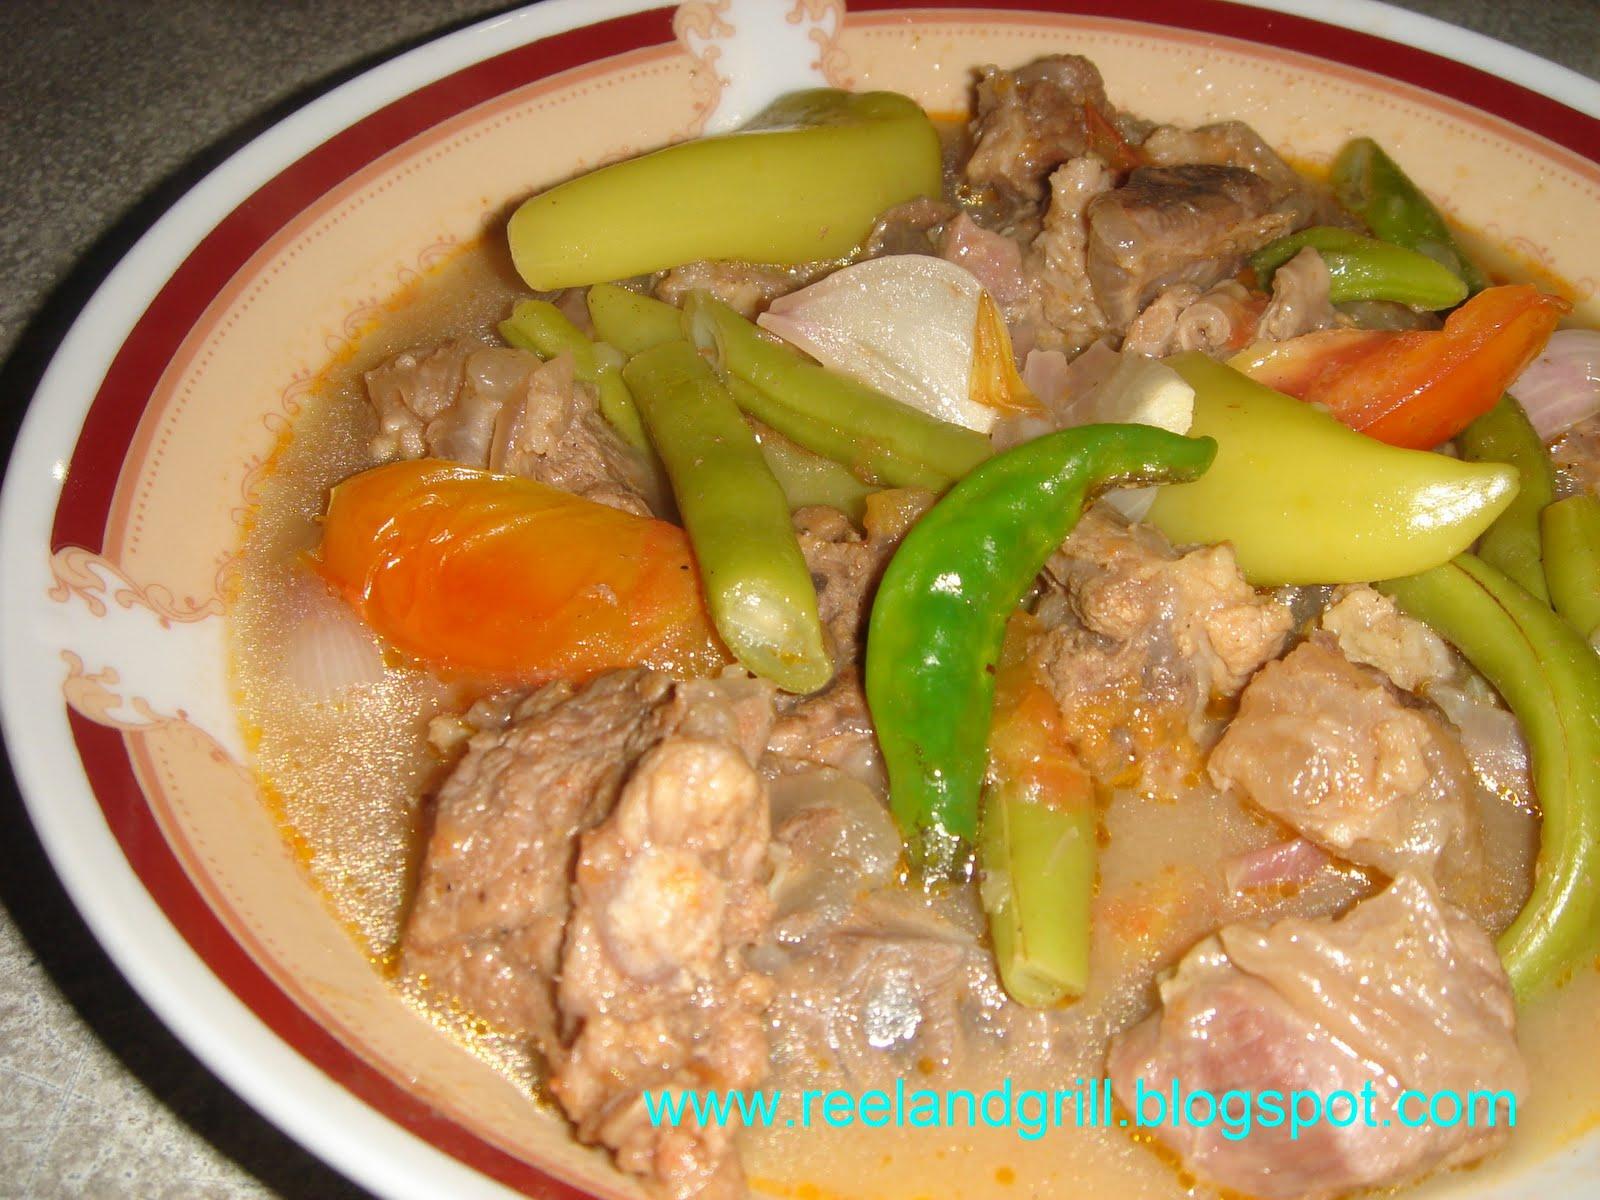 Reel and Grill: Sinigang na Baka (Beef Stew in Tamarind)